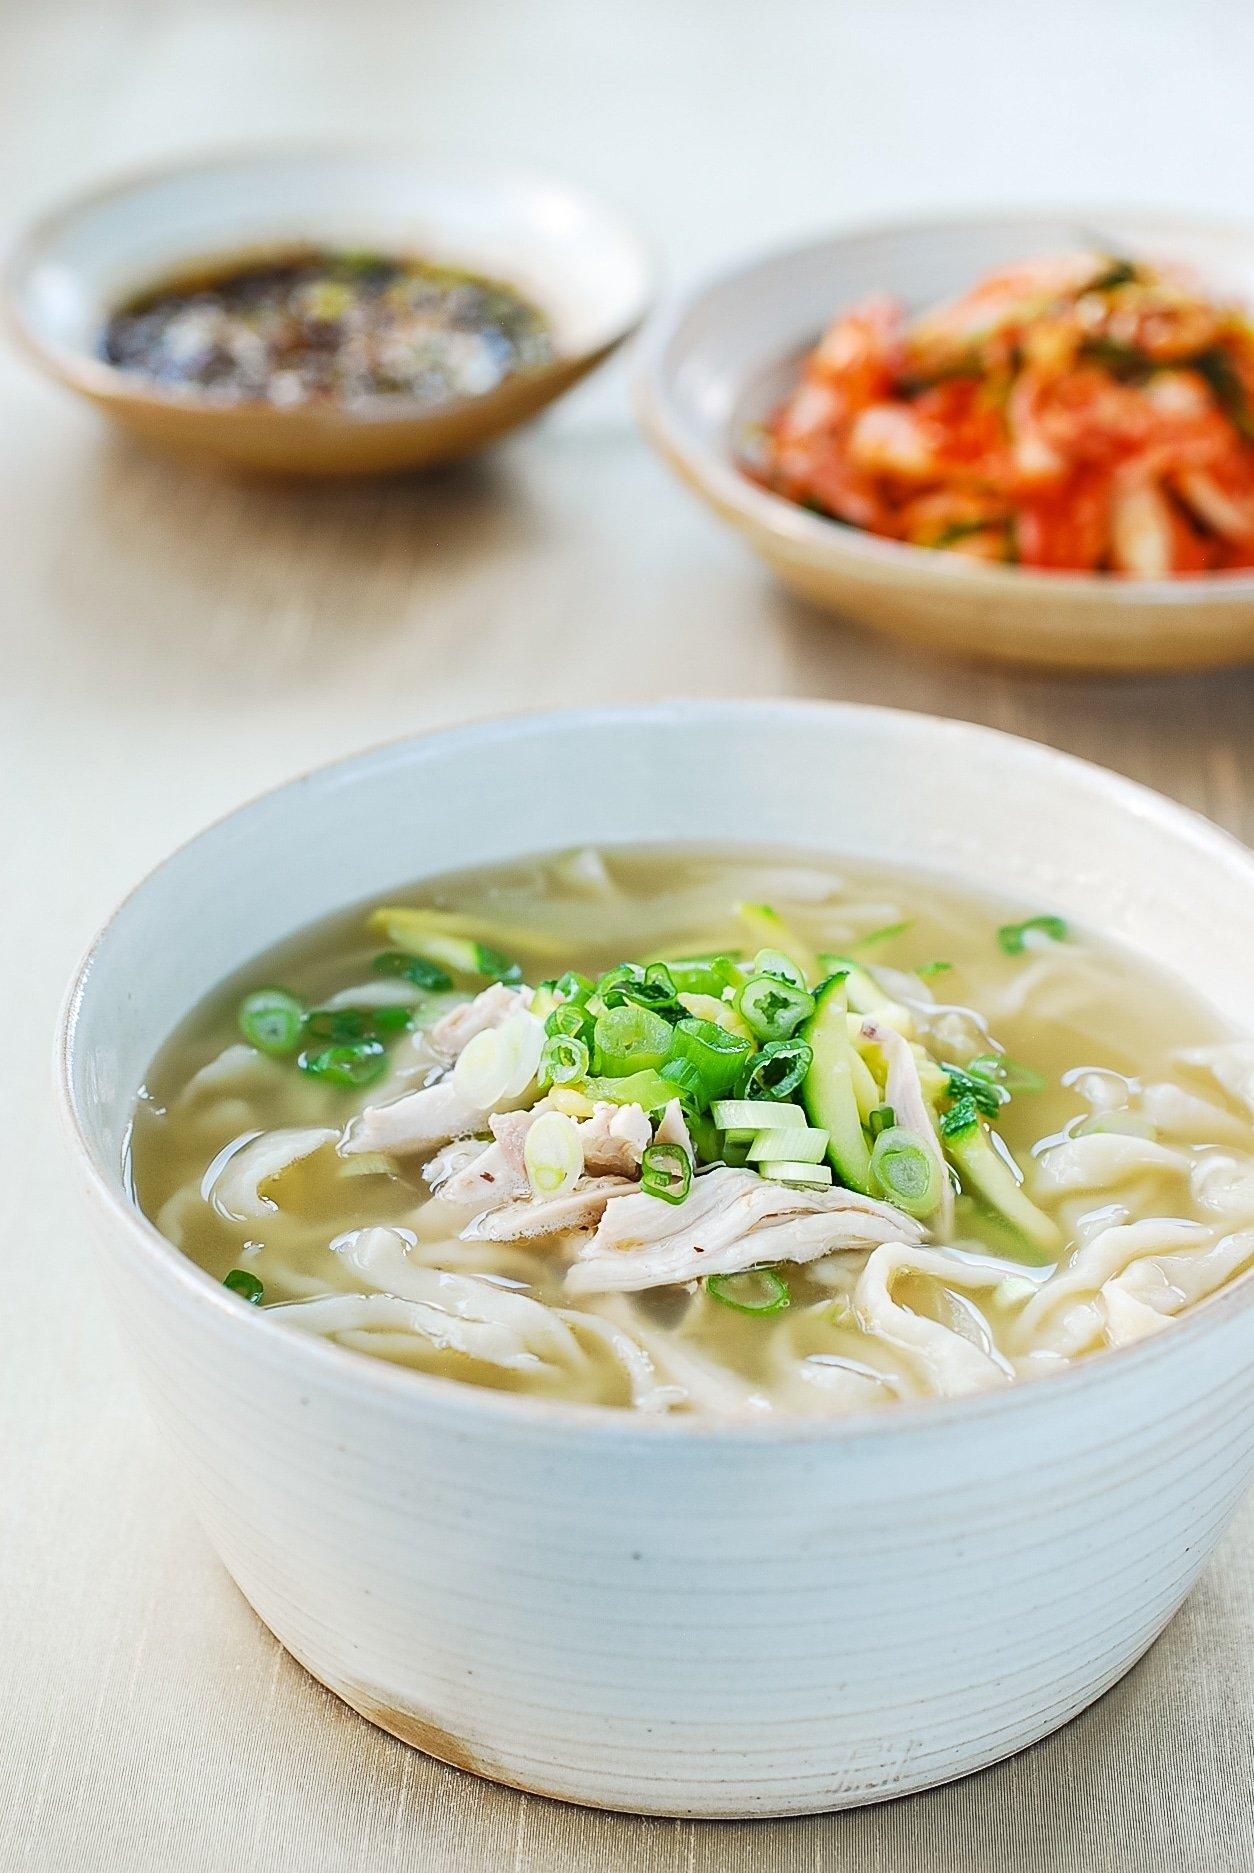 DSC 1041 - Dak Kalguksu (Chicken Noodle Soup)